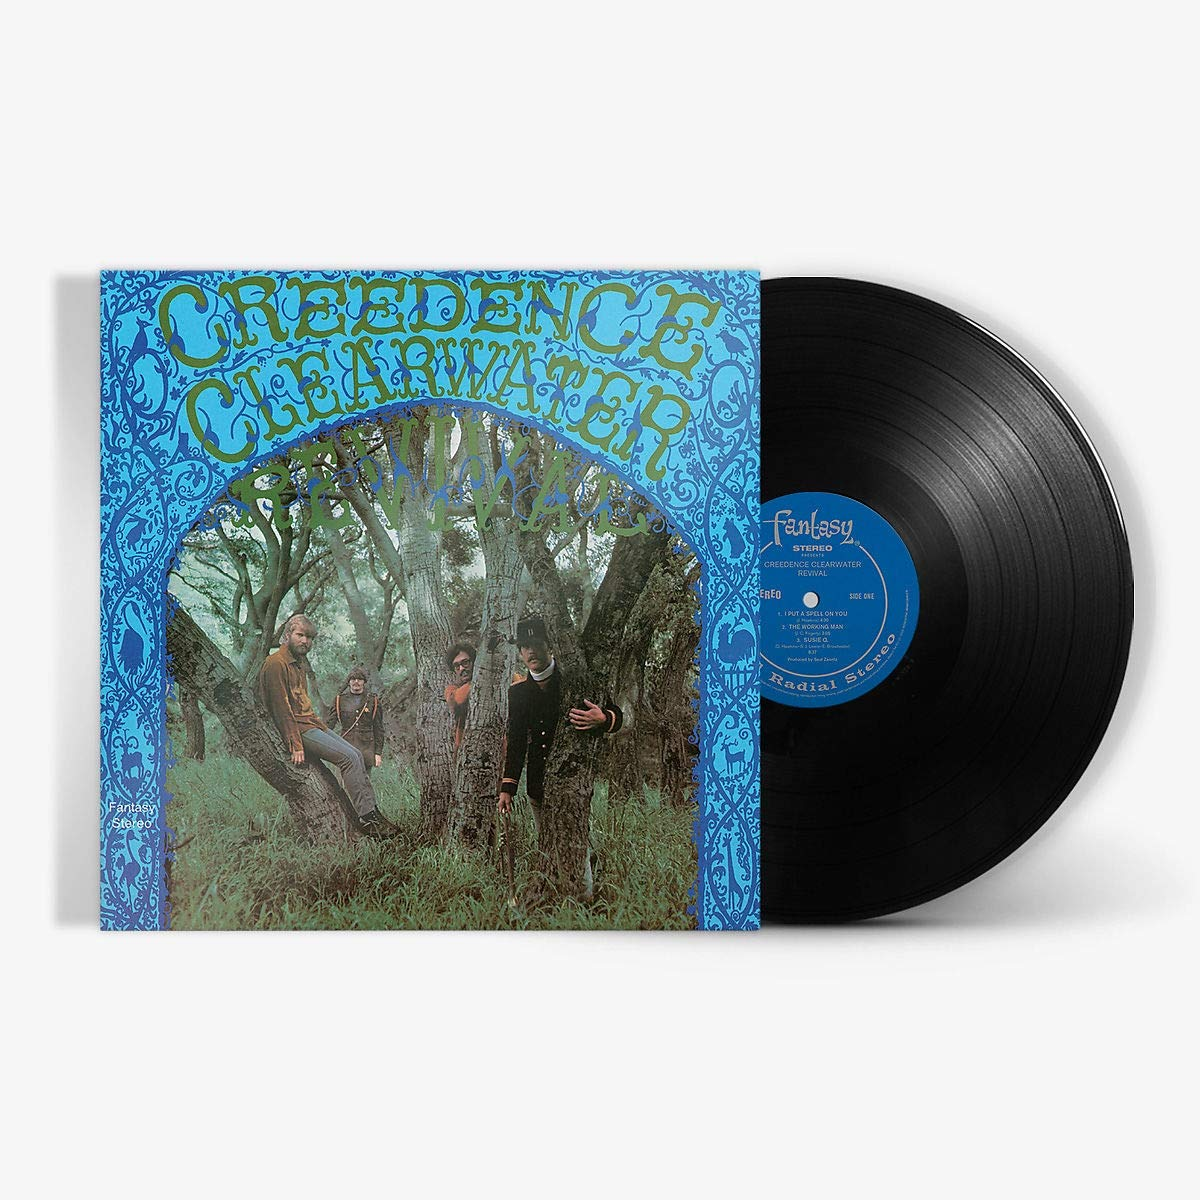 цена на Creedence Clearwater Revival Creedence Clearwater Revival. Creedence Clearwater Revival (Half Speed Master) (2 LP)